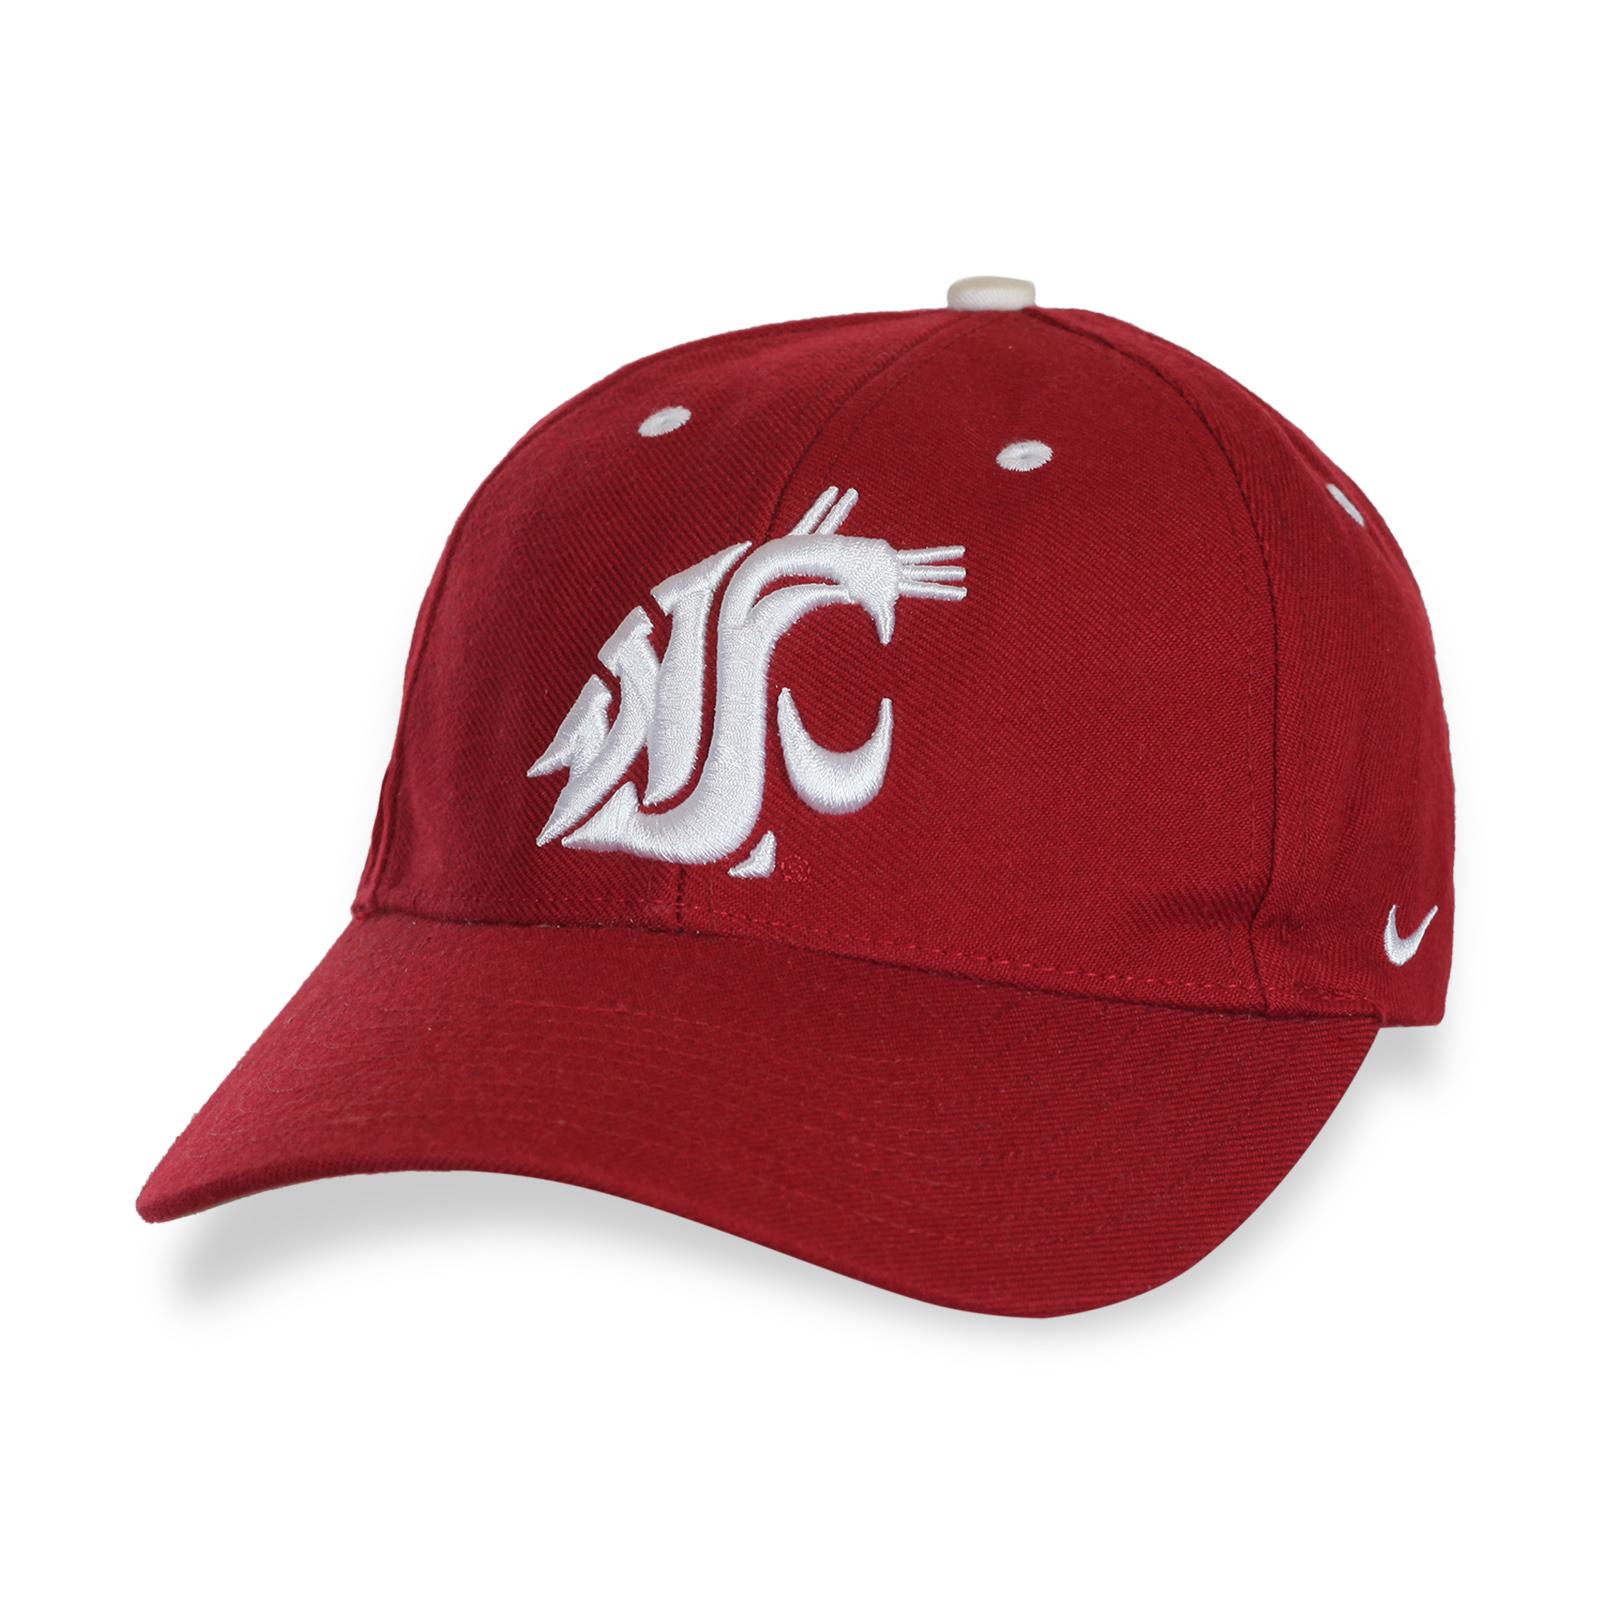 Фирменная бейсболка Washington State Cougars.